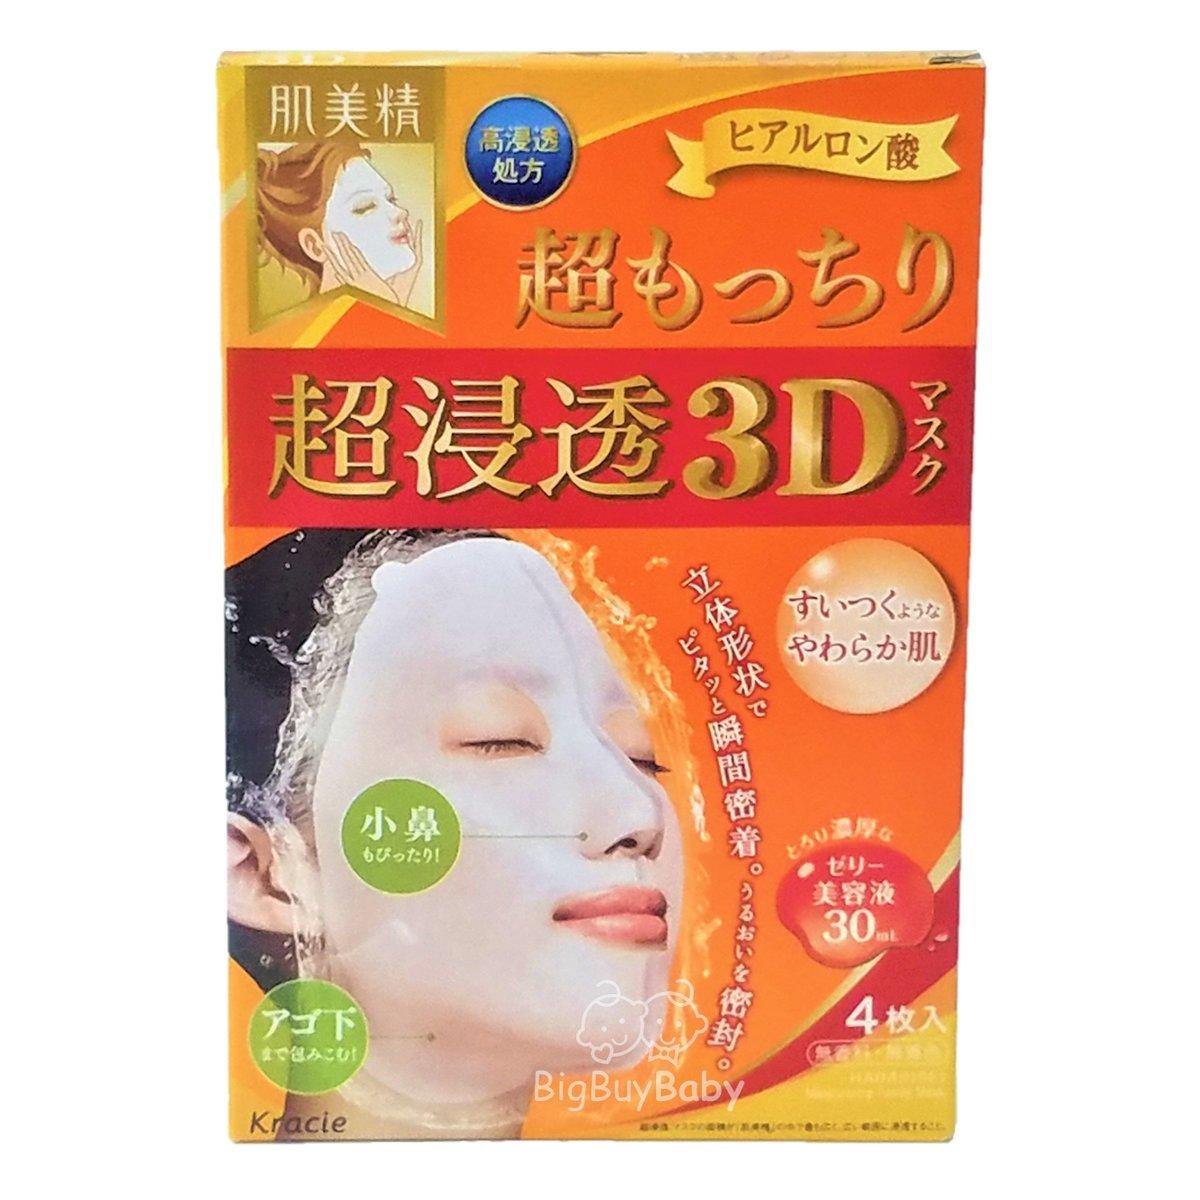 Kracie Hadabisei Advanced Penetrating 3D Face Mask (Super Suppleness)